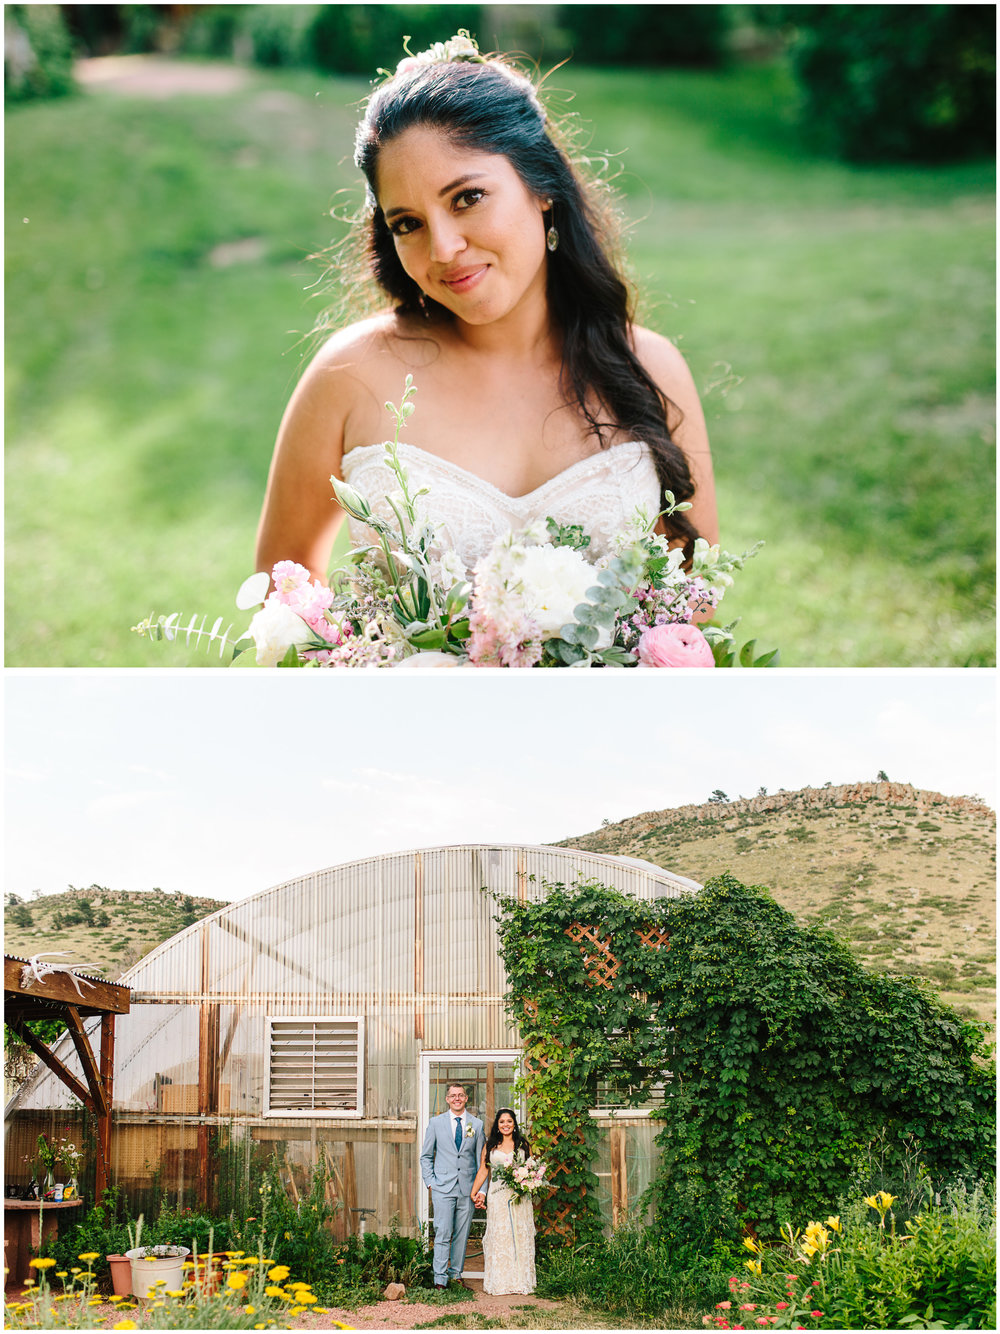 lyons_farmette_wedding_53.jpg